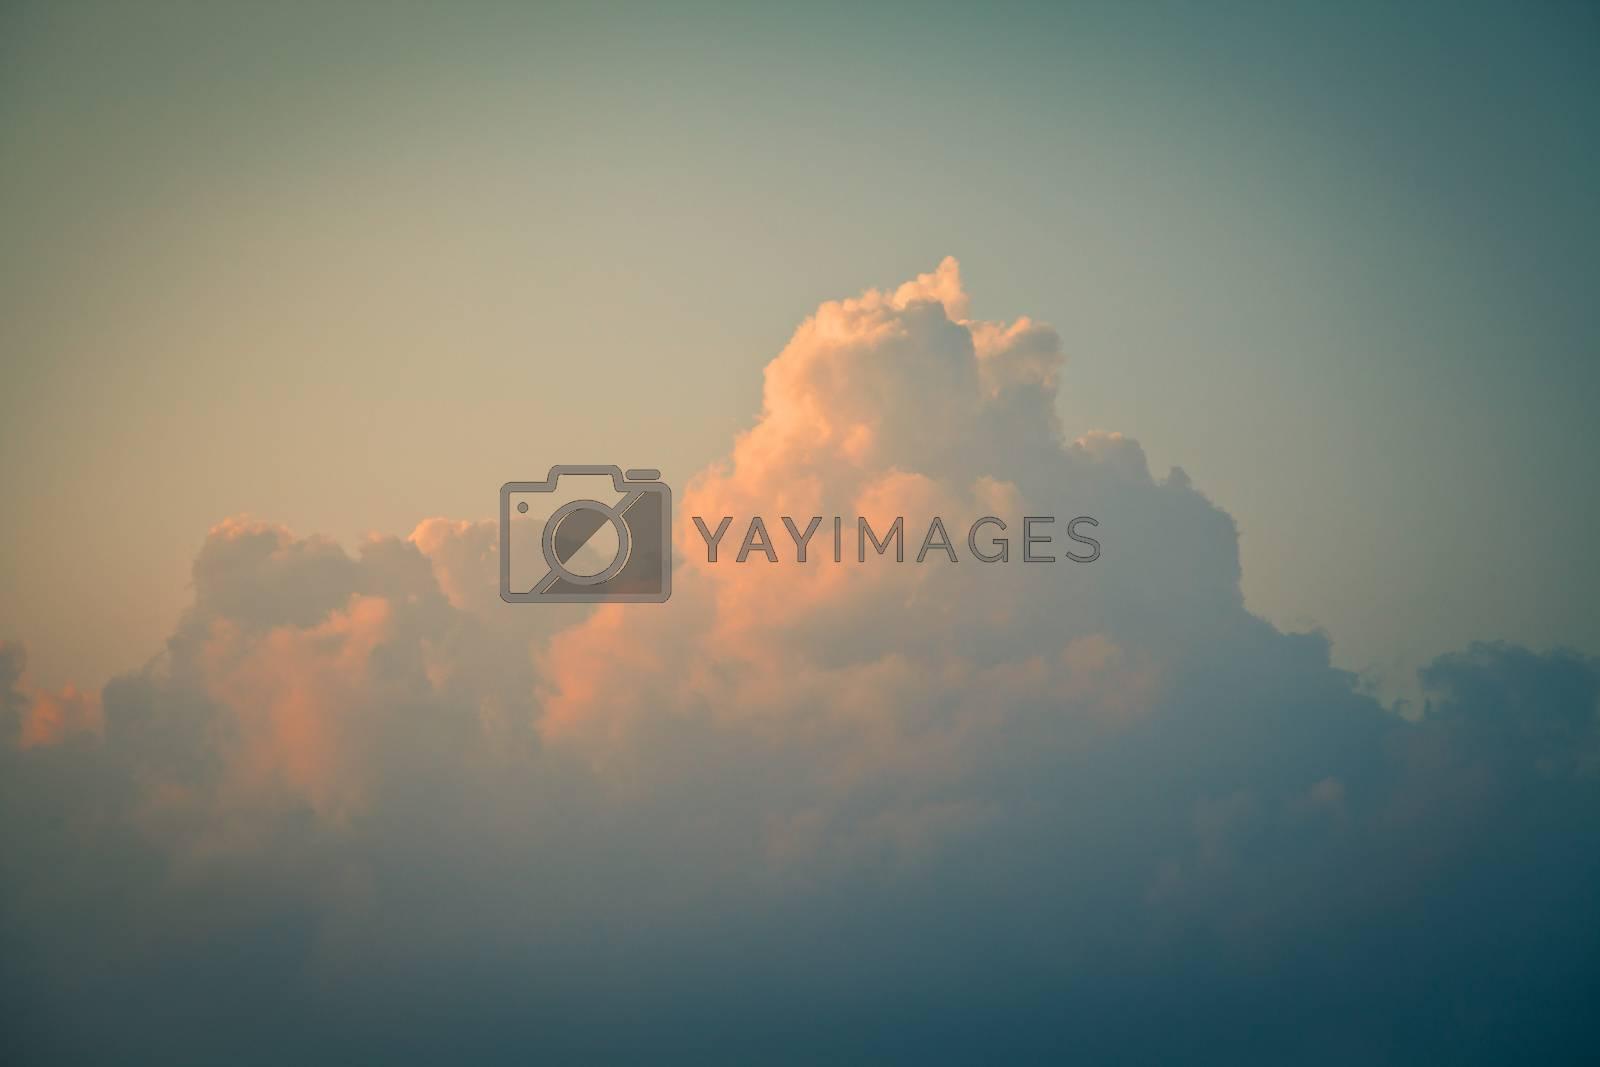 Cumulus clouds at dawn. Toned image